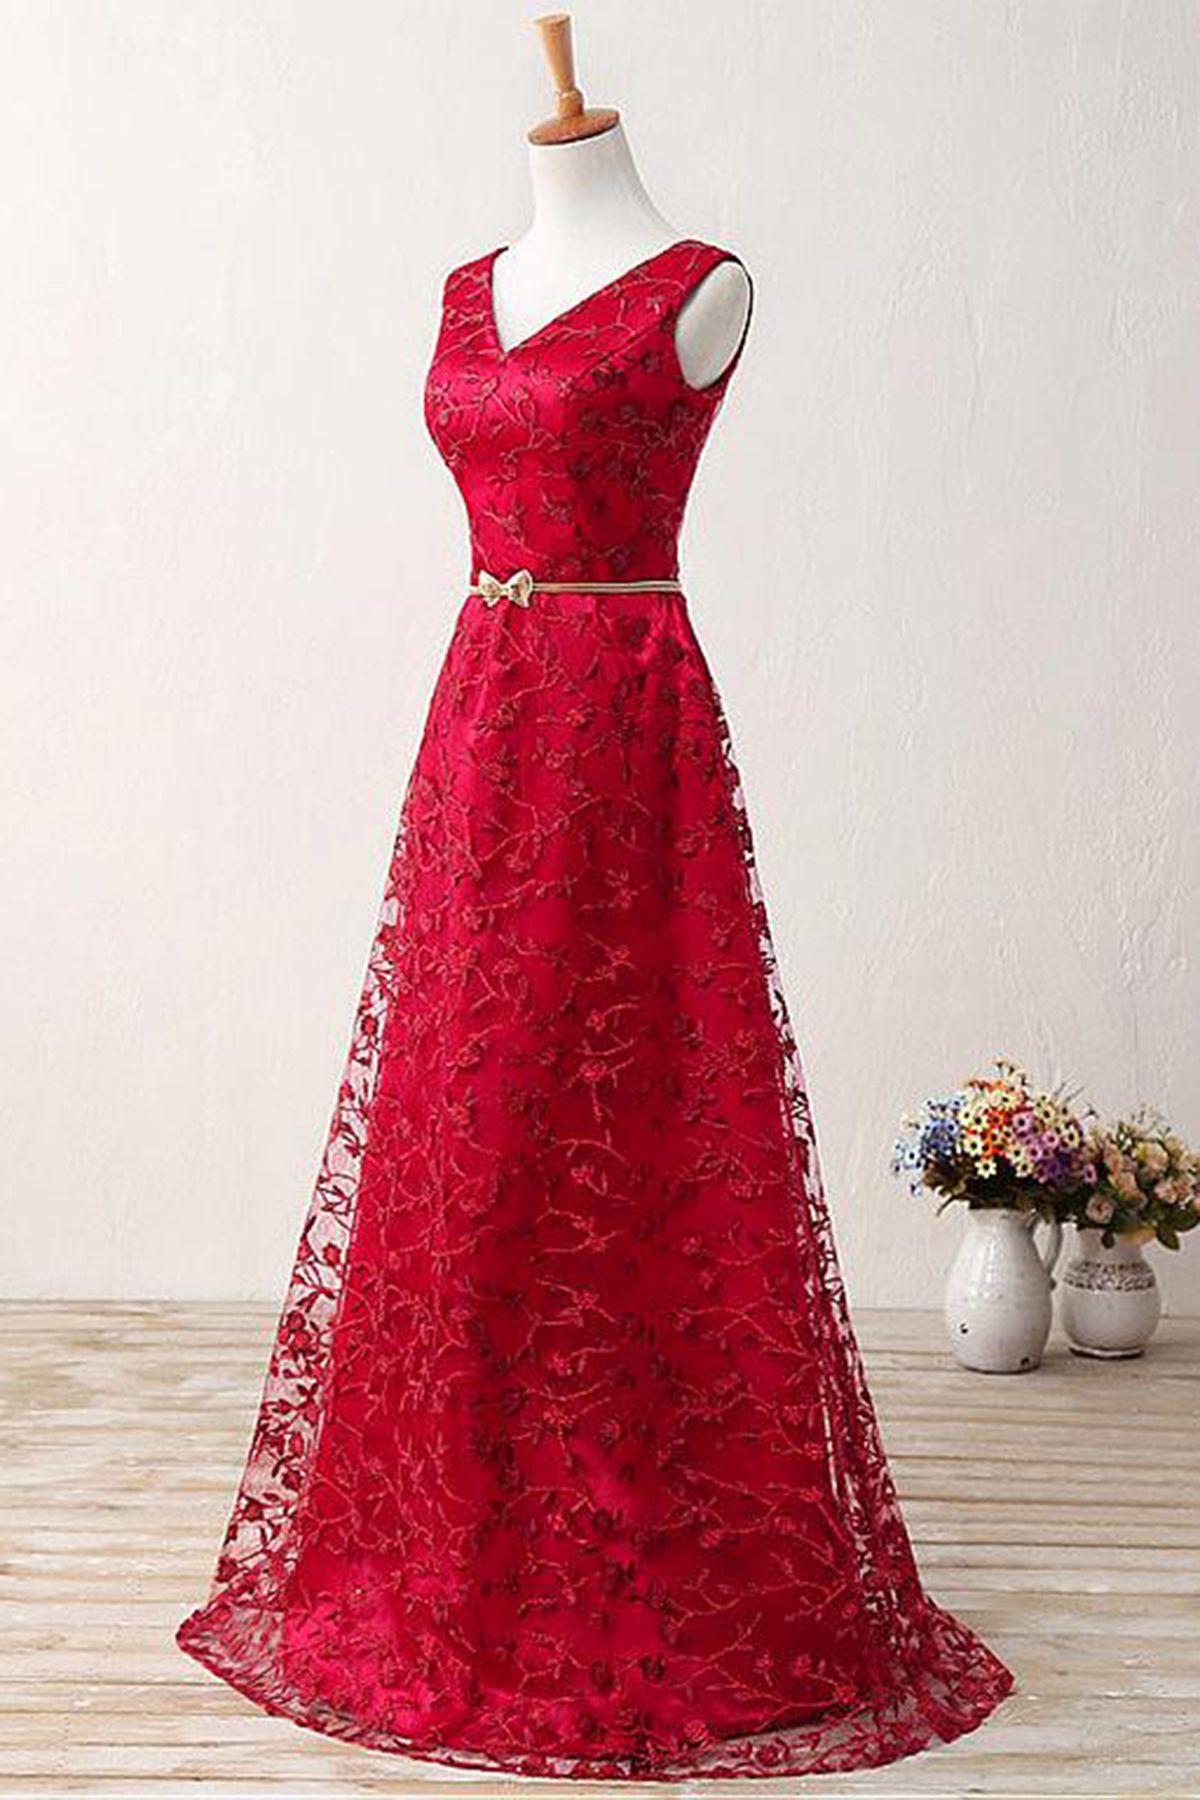 Gorgeous red lace senior prom dress promdress prom pinterest